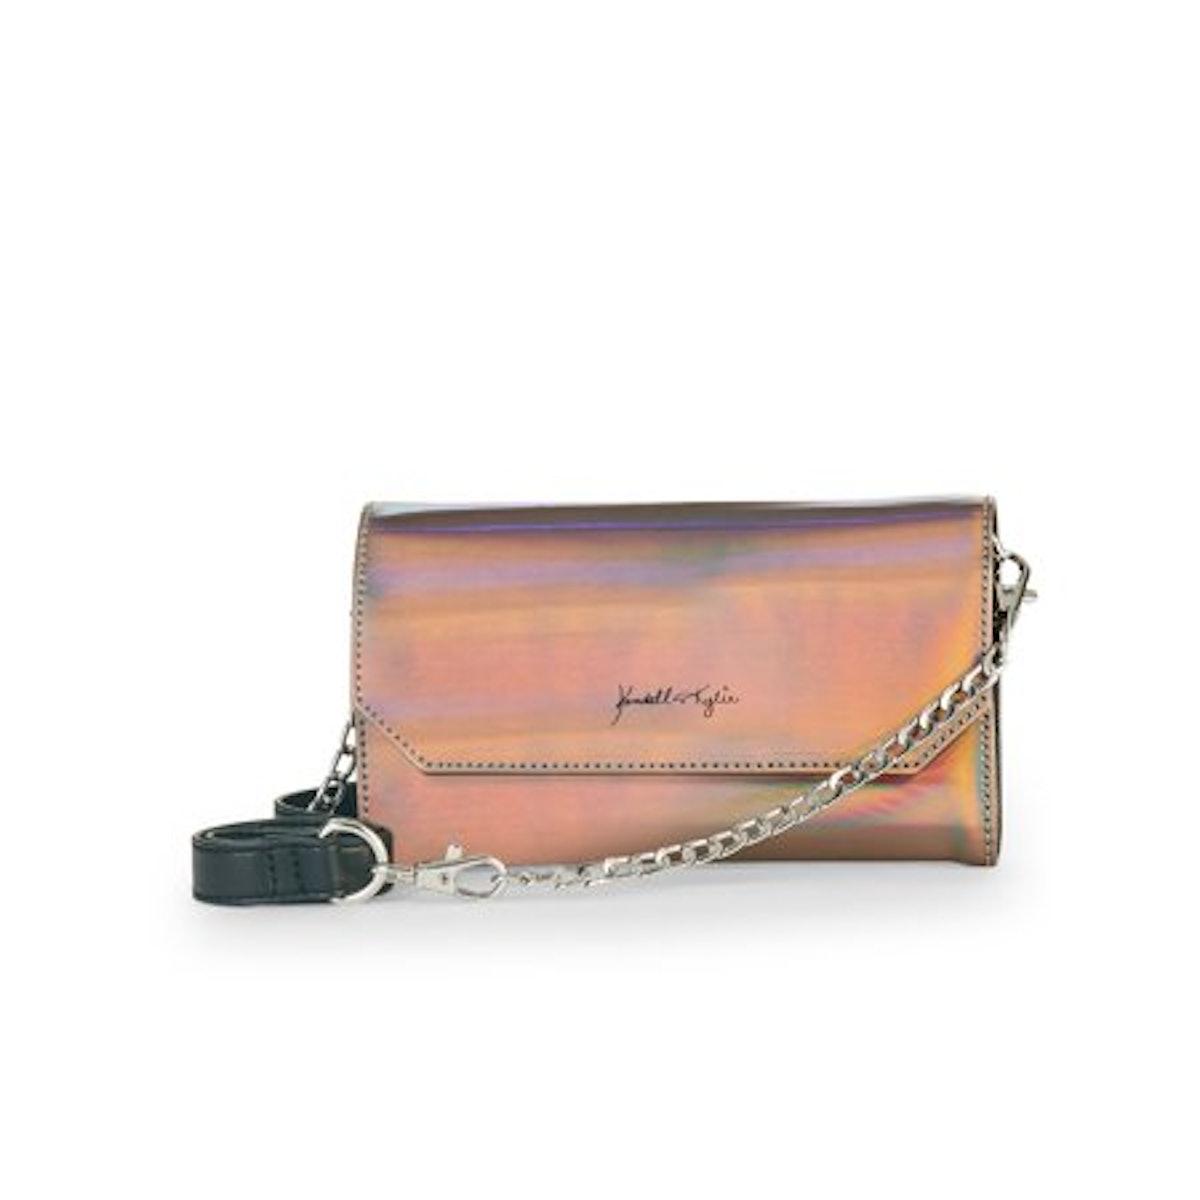 Kendall + Kylie for Walmart Iridescent Oil Slick Belt Bag/Crossbody